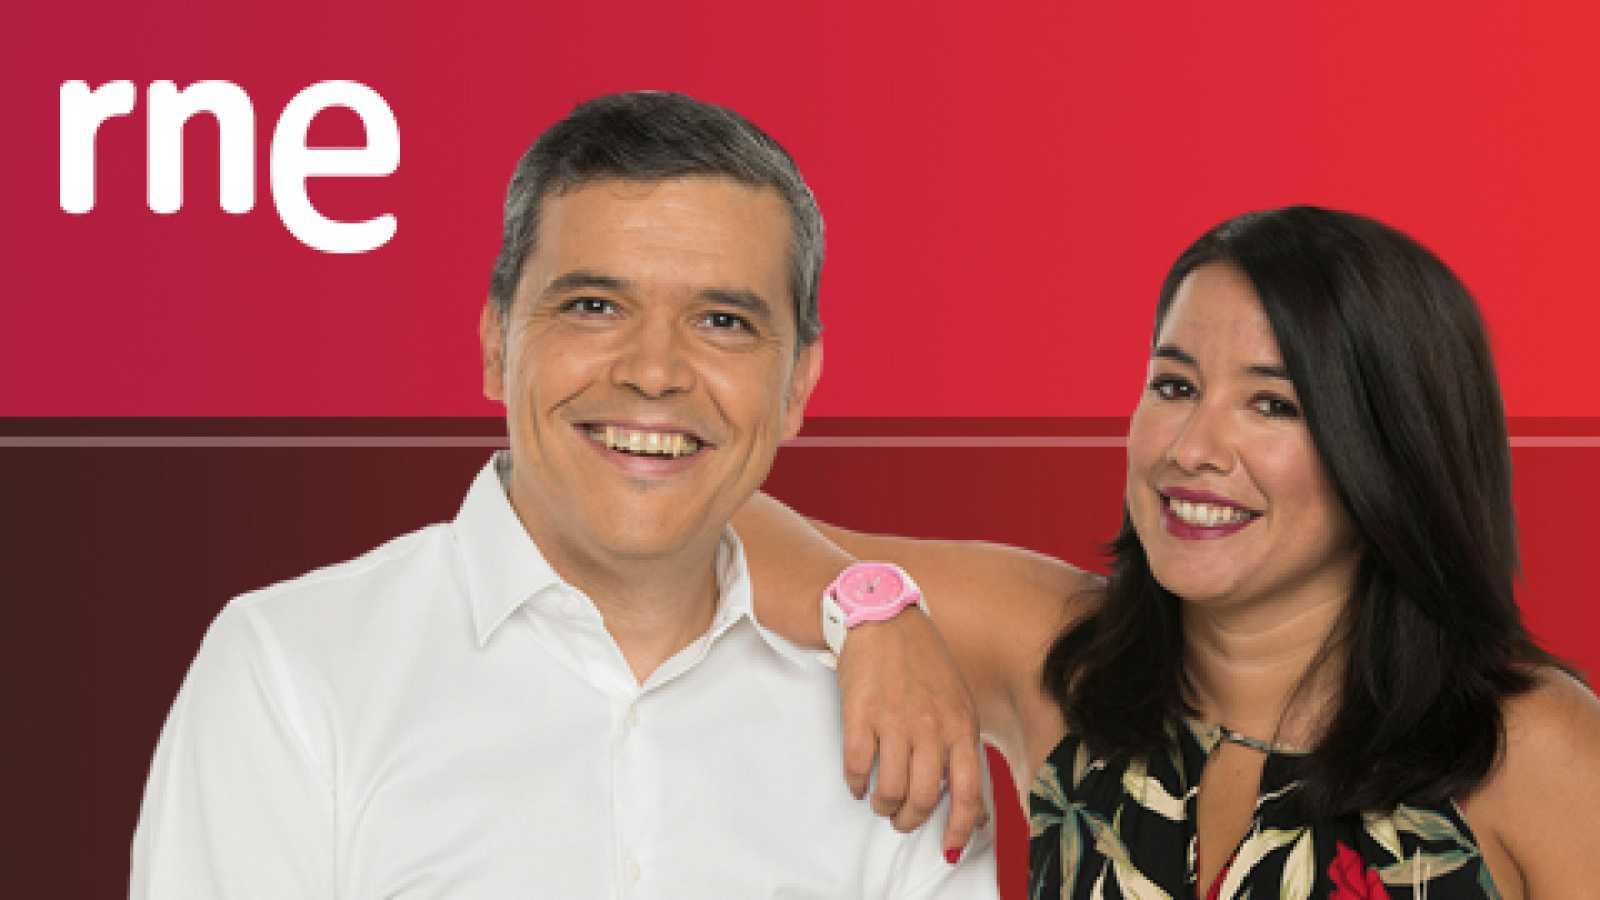 Las mañanas de RNE con Alfredo Menéndez - Segunda hora - 27/08/19 - escuchar ahora